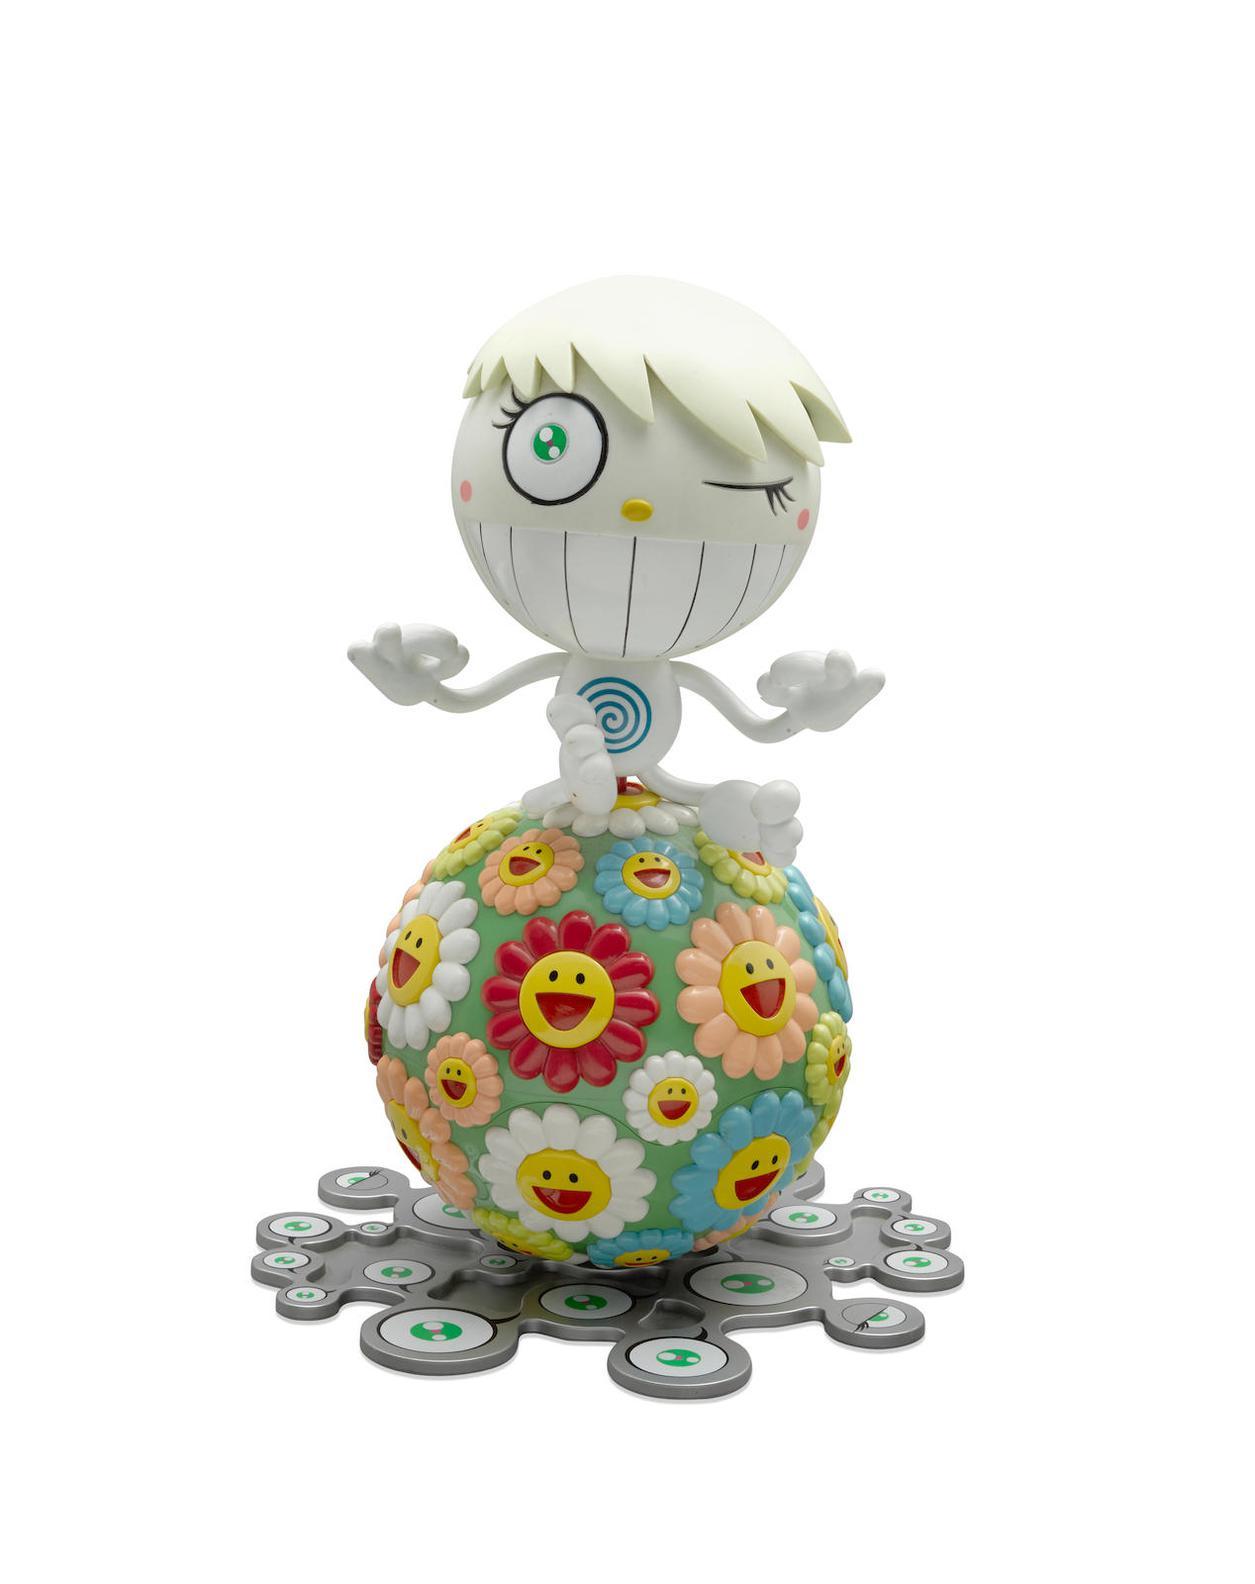 Takashi Murakami-Mr. Wink, Cosmos Ball-2000